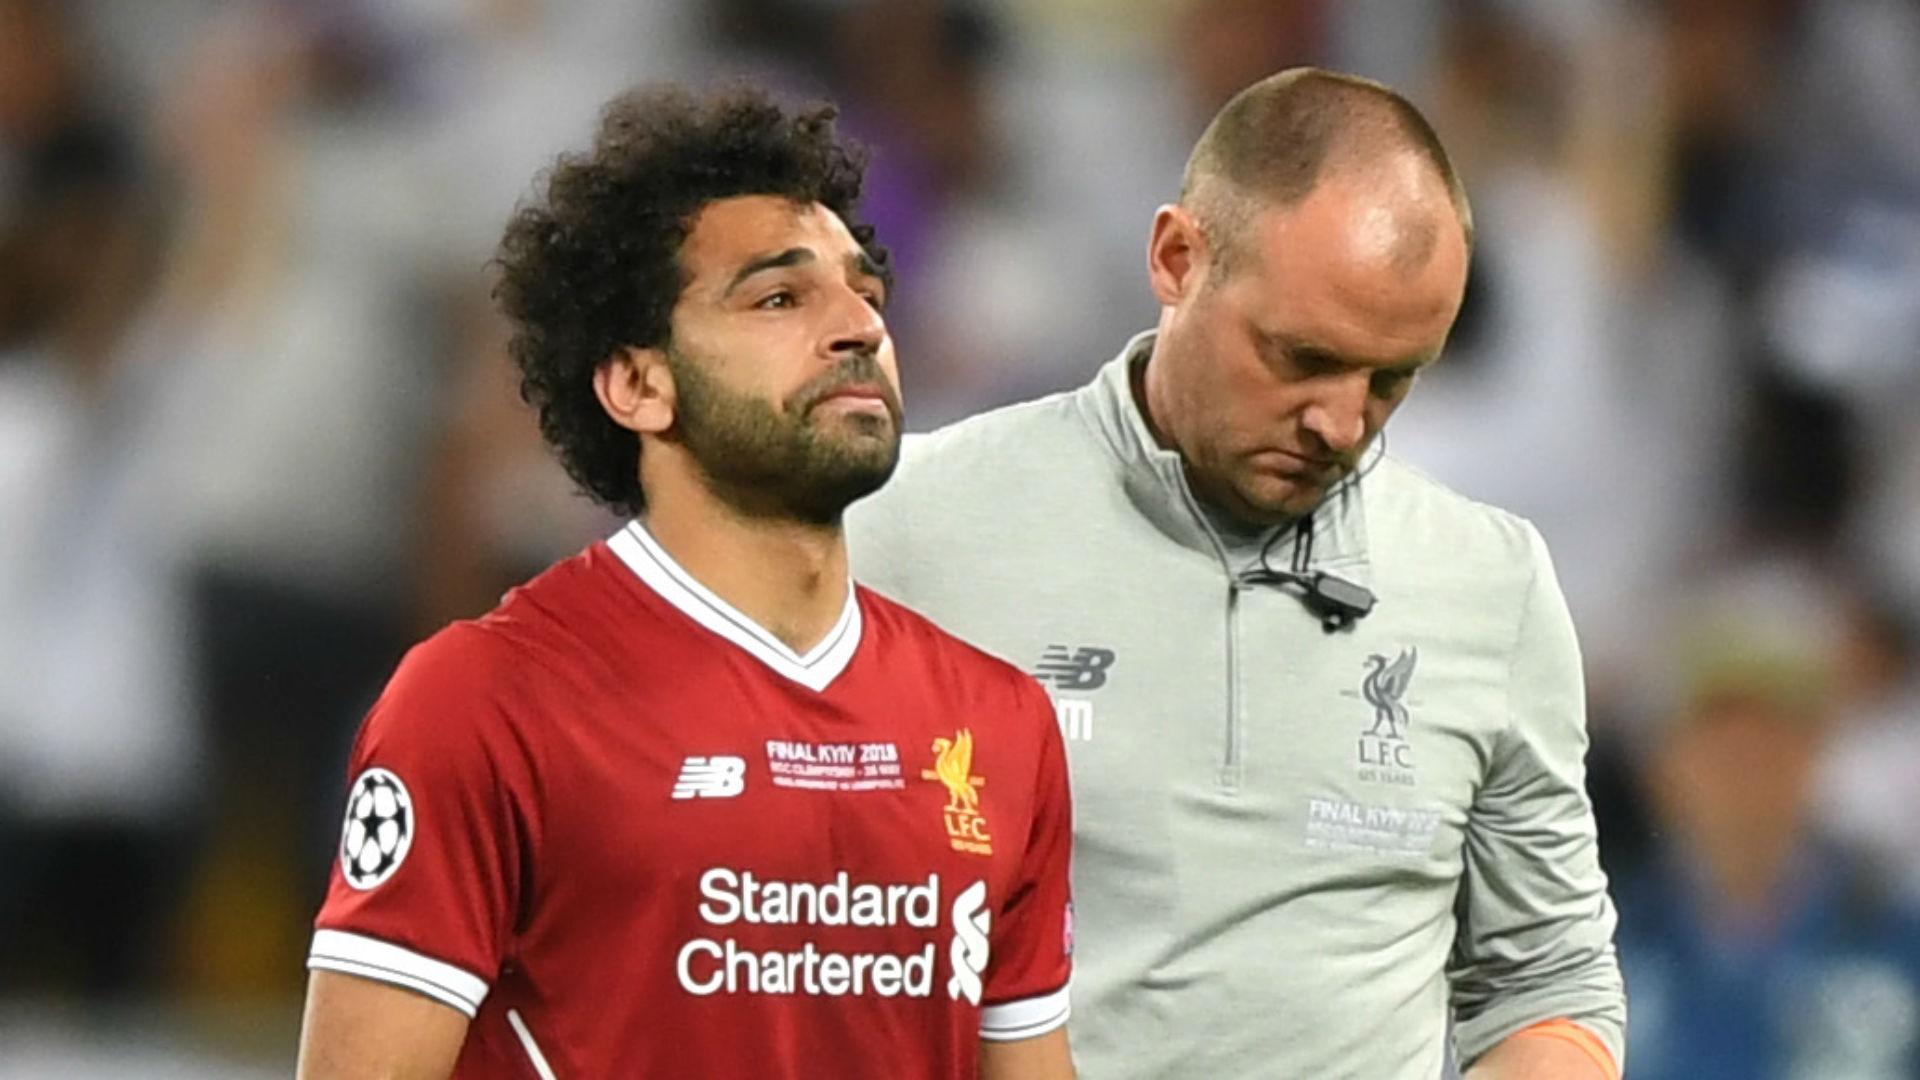 Mohamed Salah Liverpool Champions League final 2018